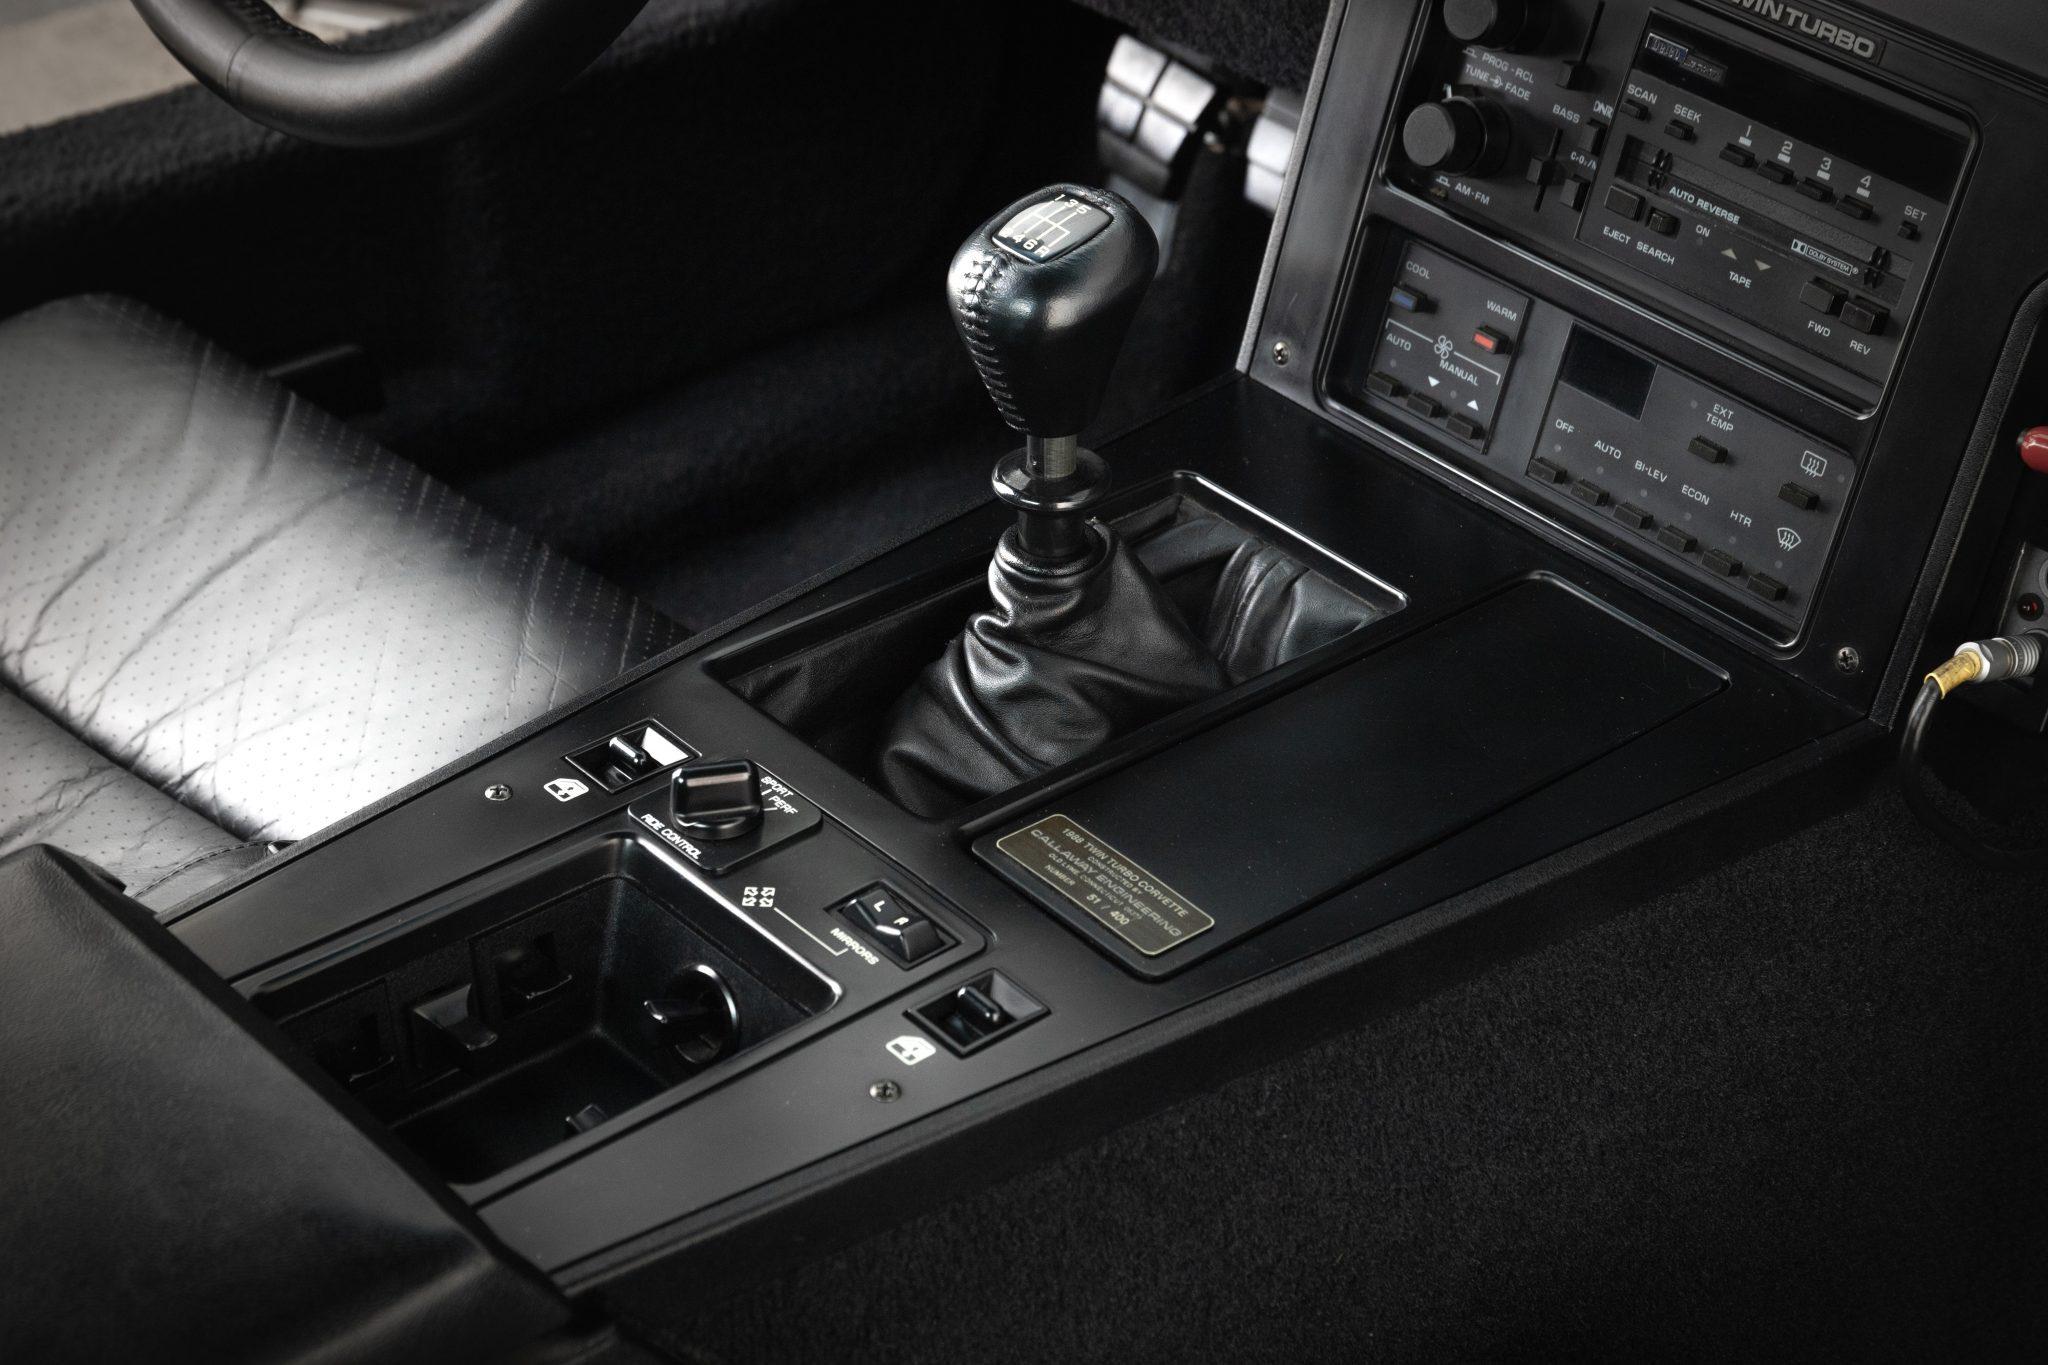 1988 Chevrolet Corvette Callaway SledgeHammer BaT interior console shifter